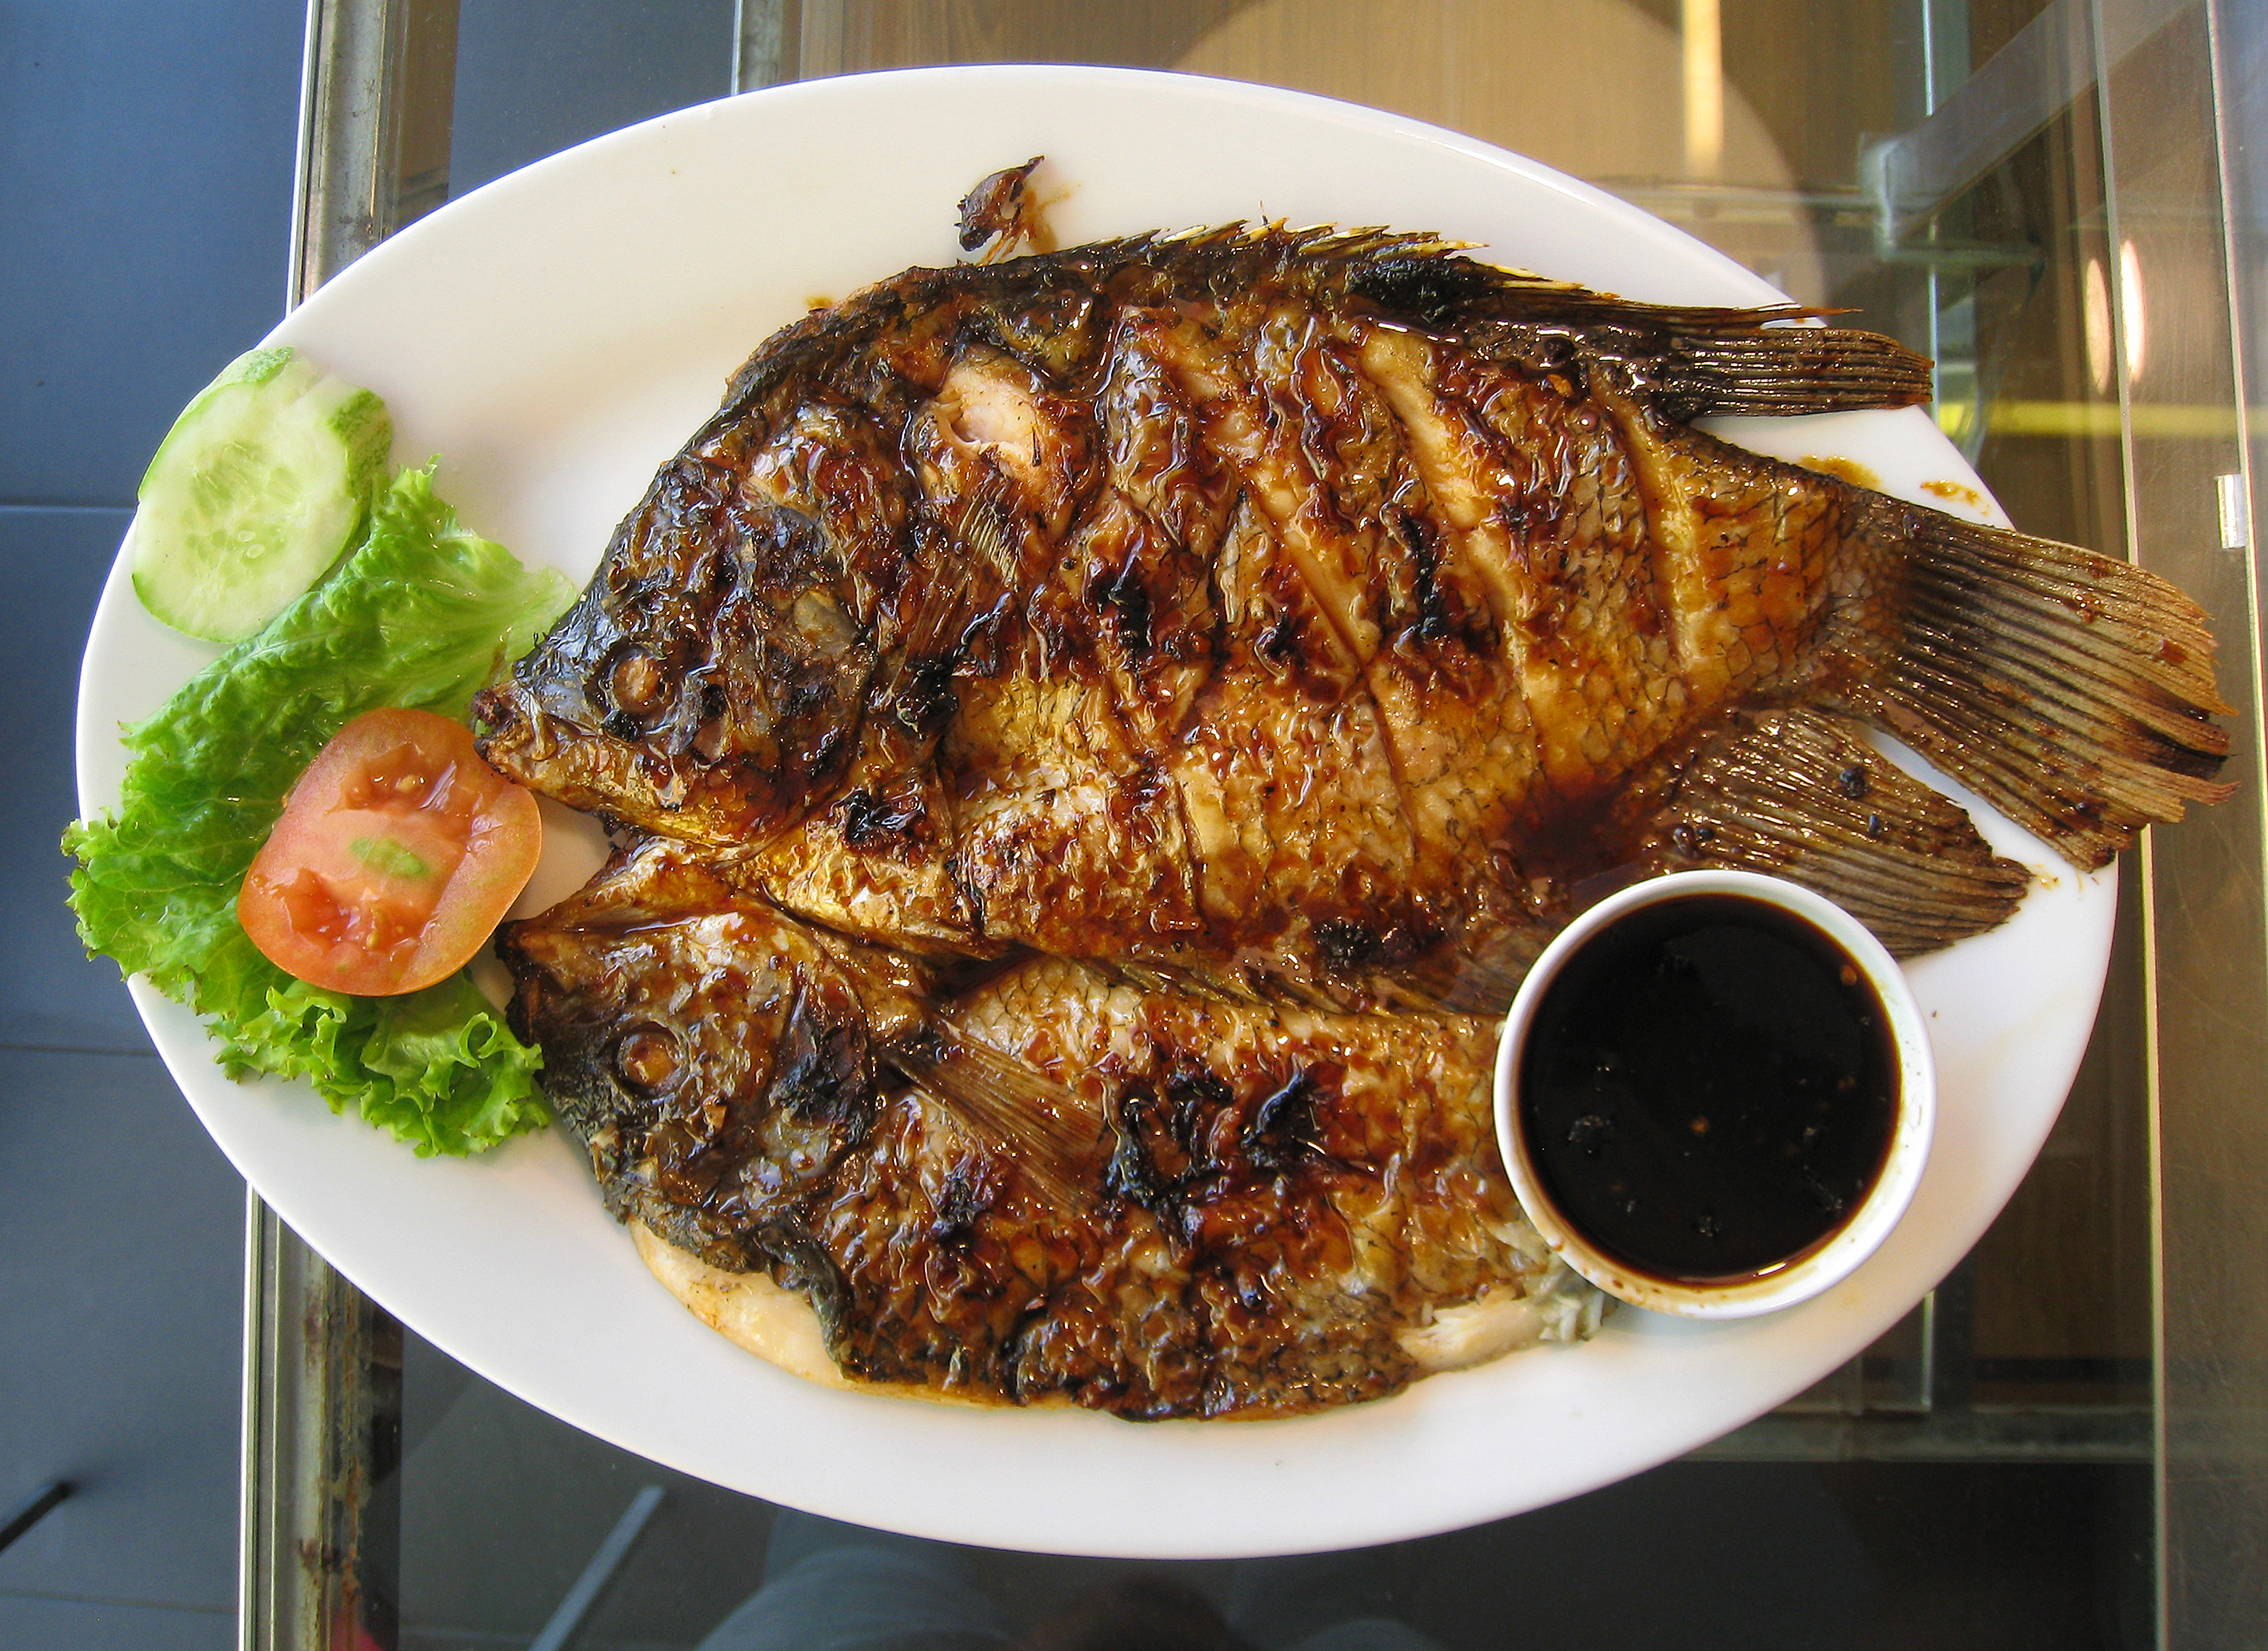 Resepi Ikan Tenggiri Masak Singgang Pedas - Resep Bunda Erita